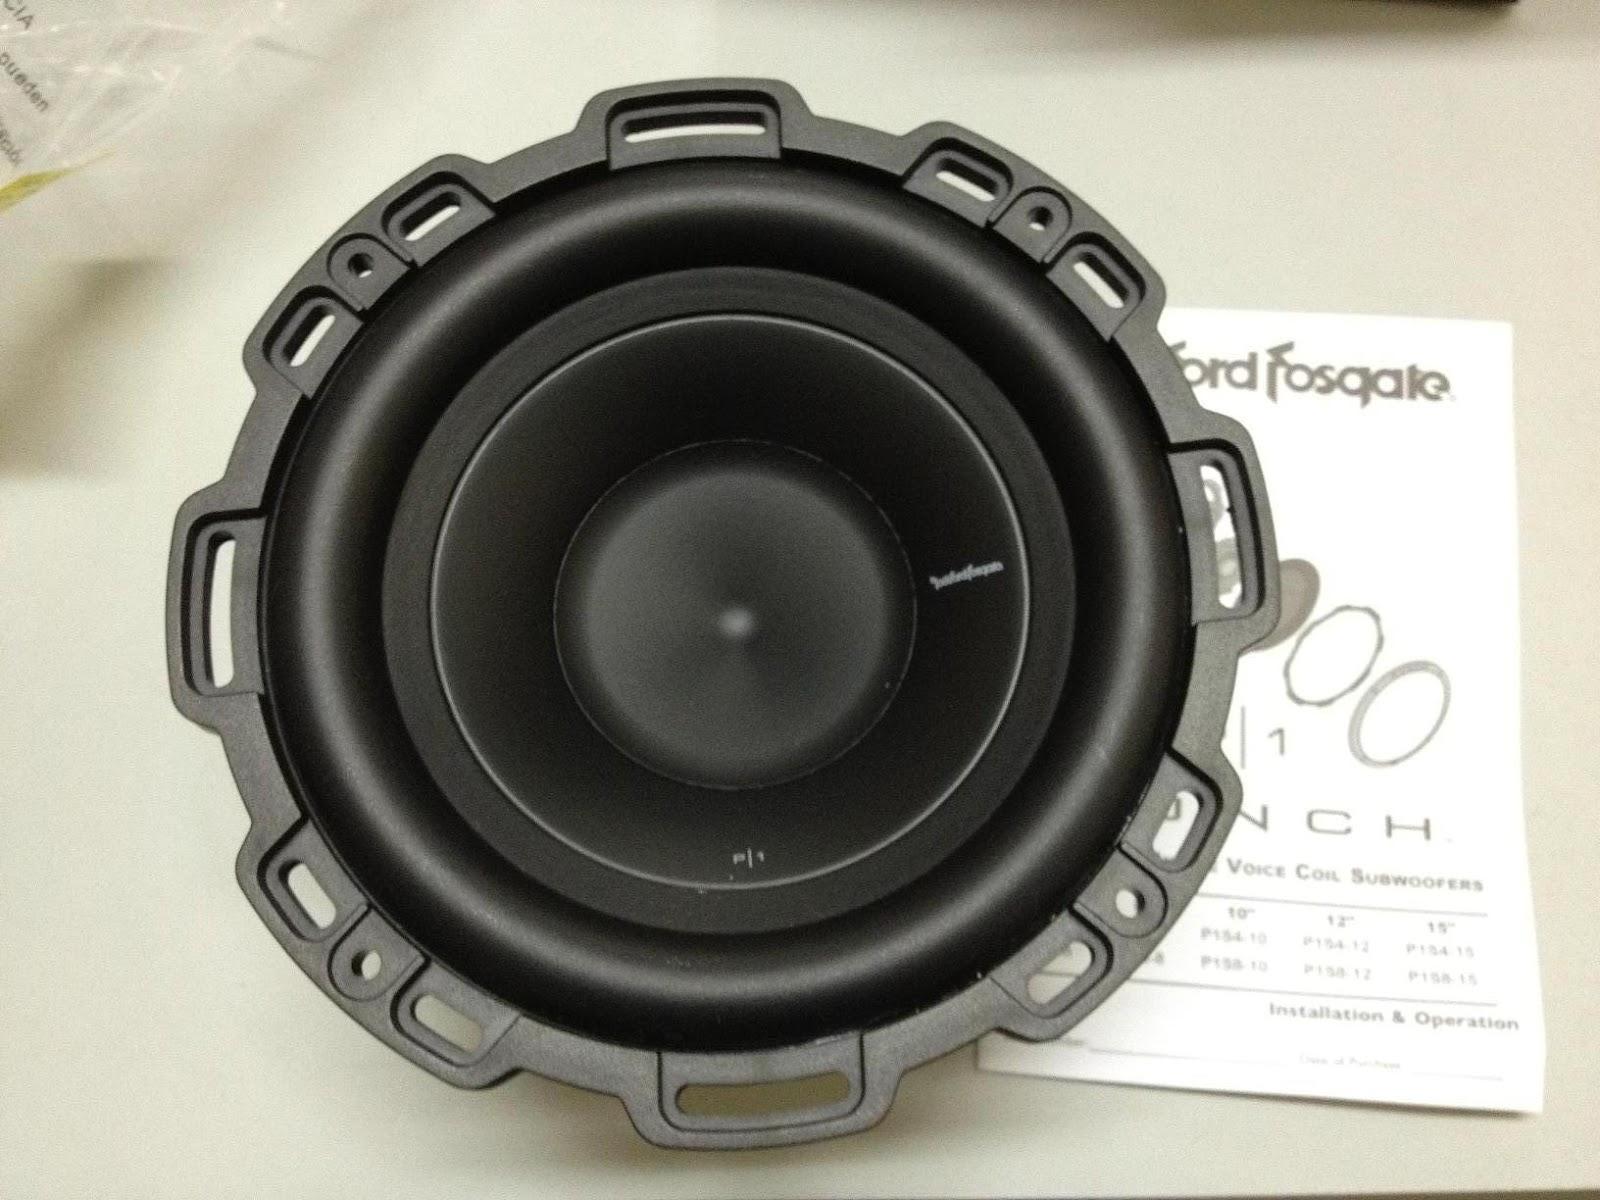 Rockford fosgate p1s8